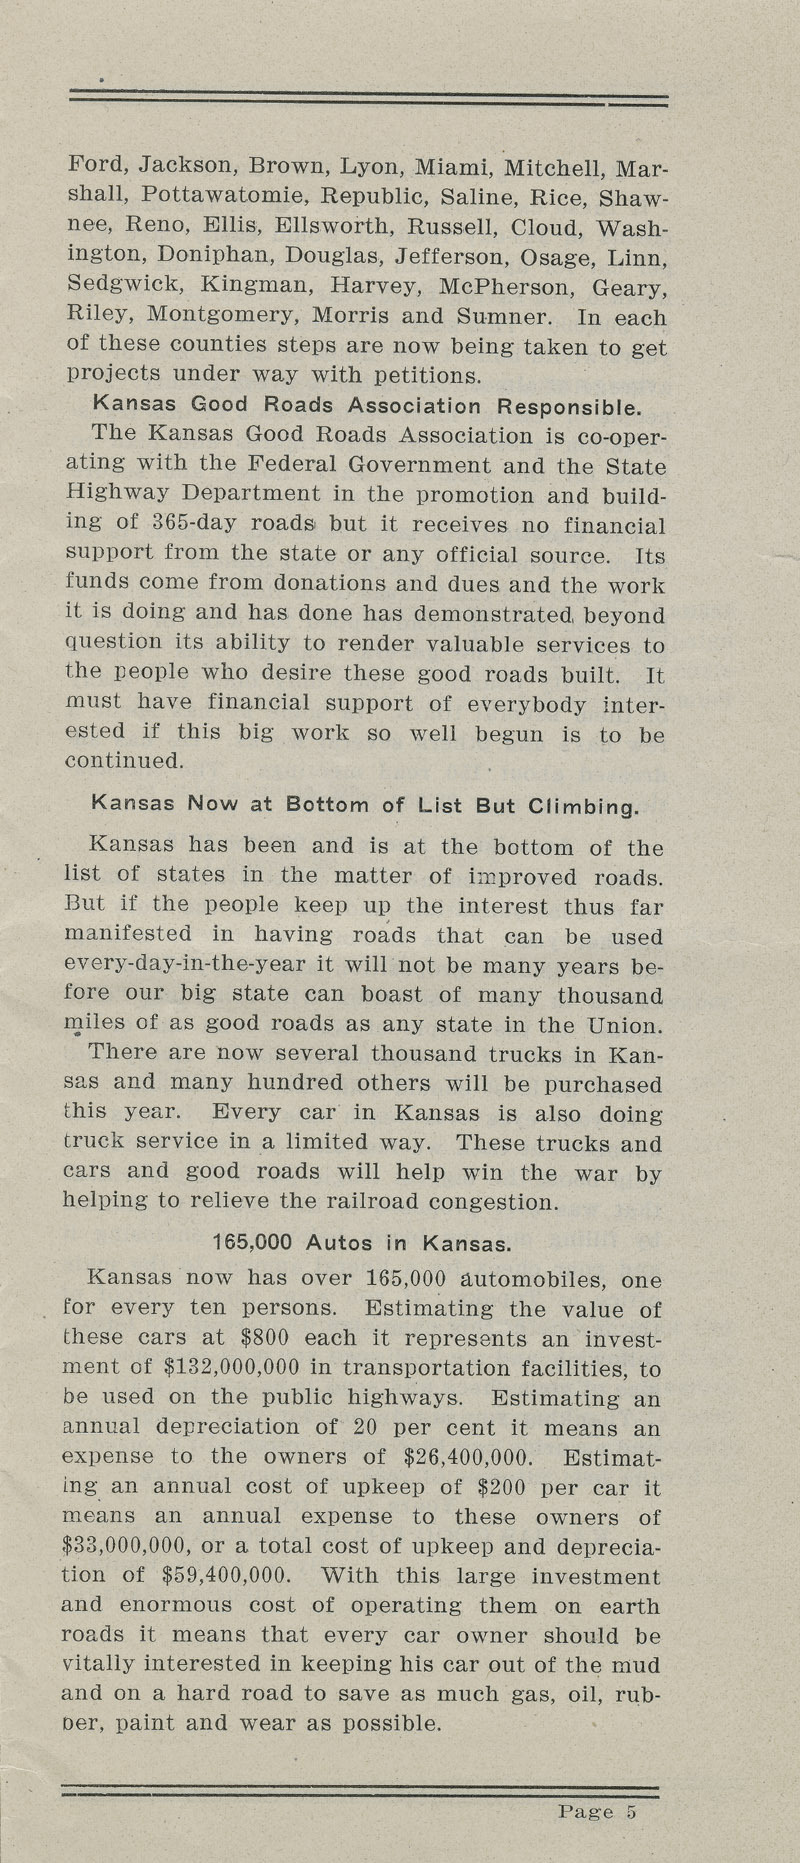 Annual report : Kansas Good Roads Association - pg. 5